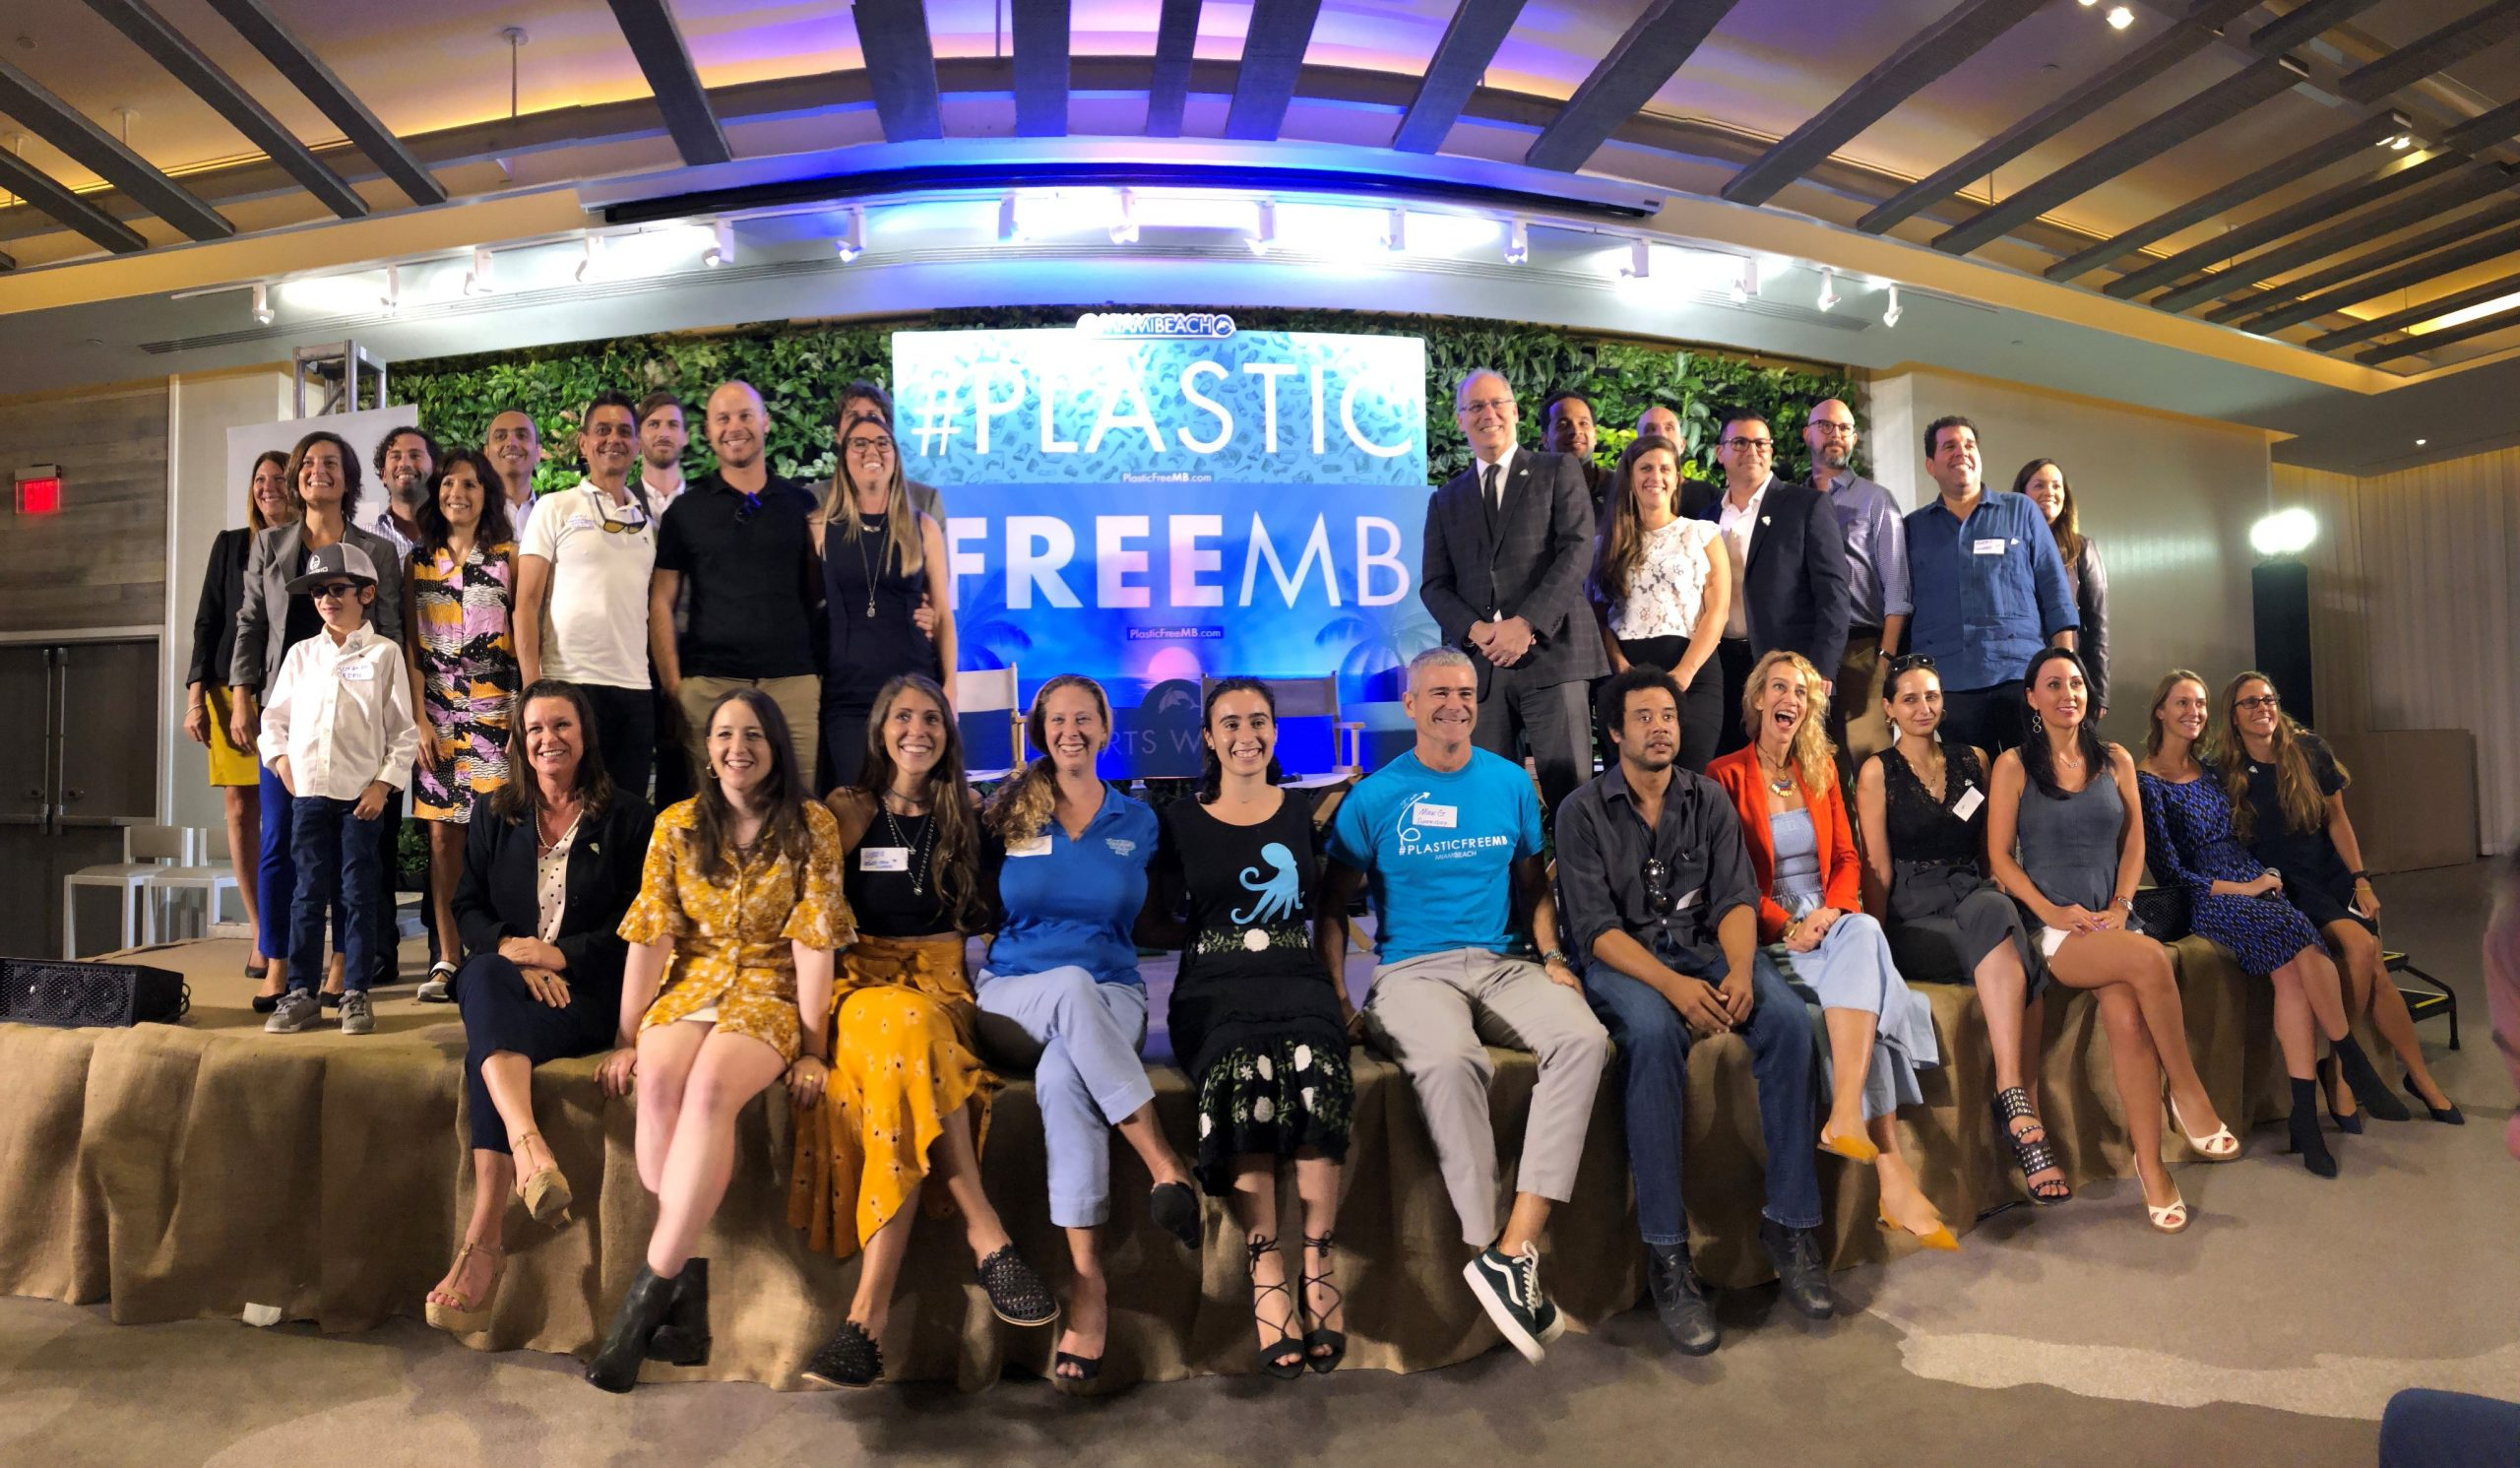 #PlasticFreeMB Plastic Free July Challenge